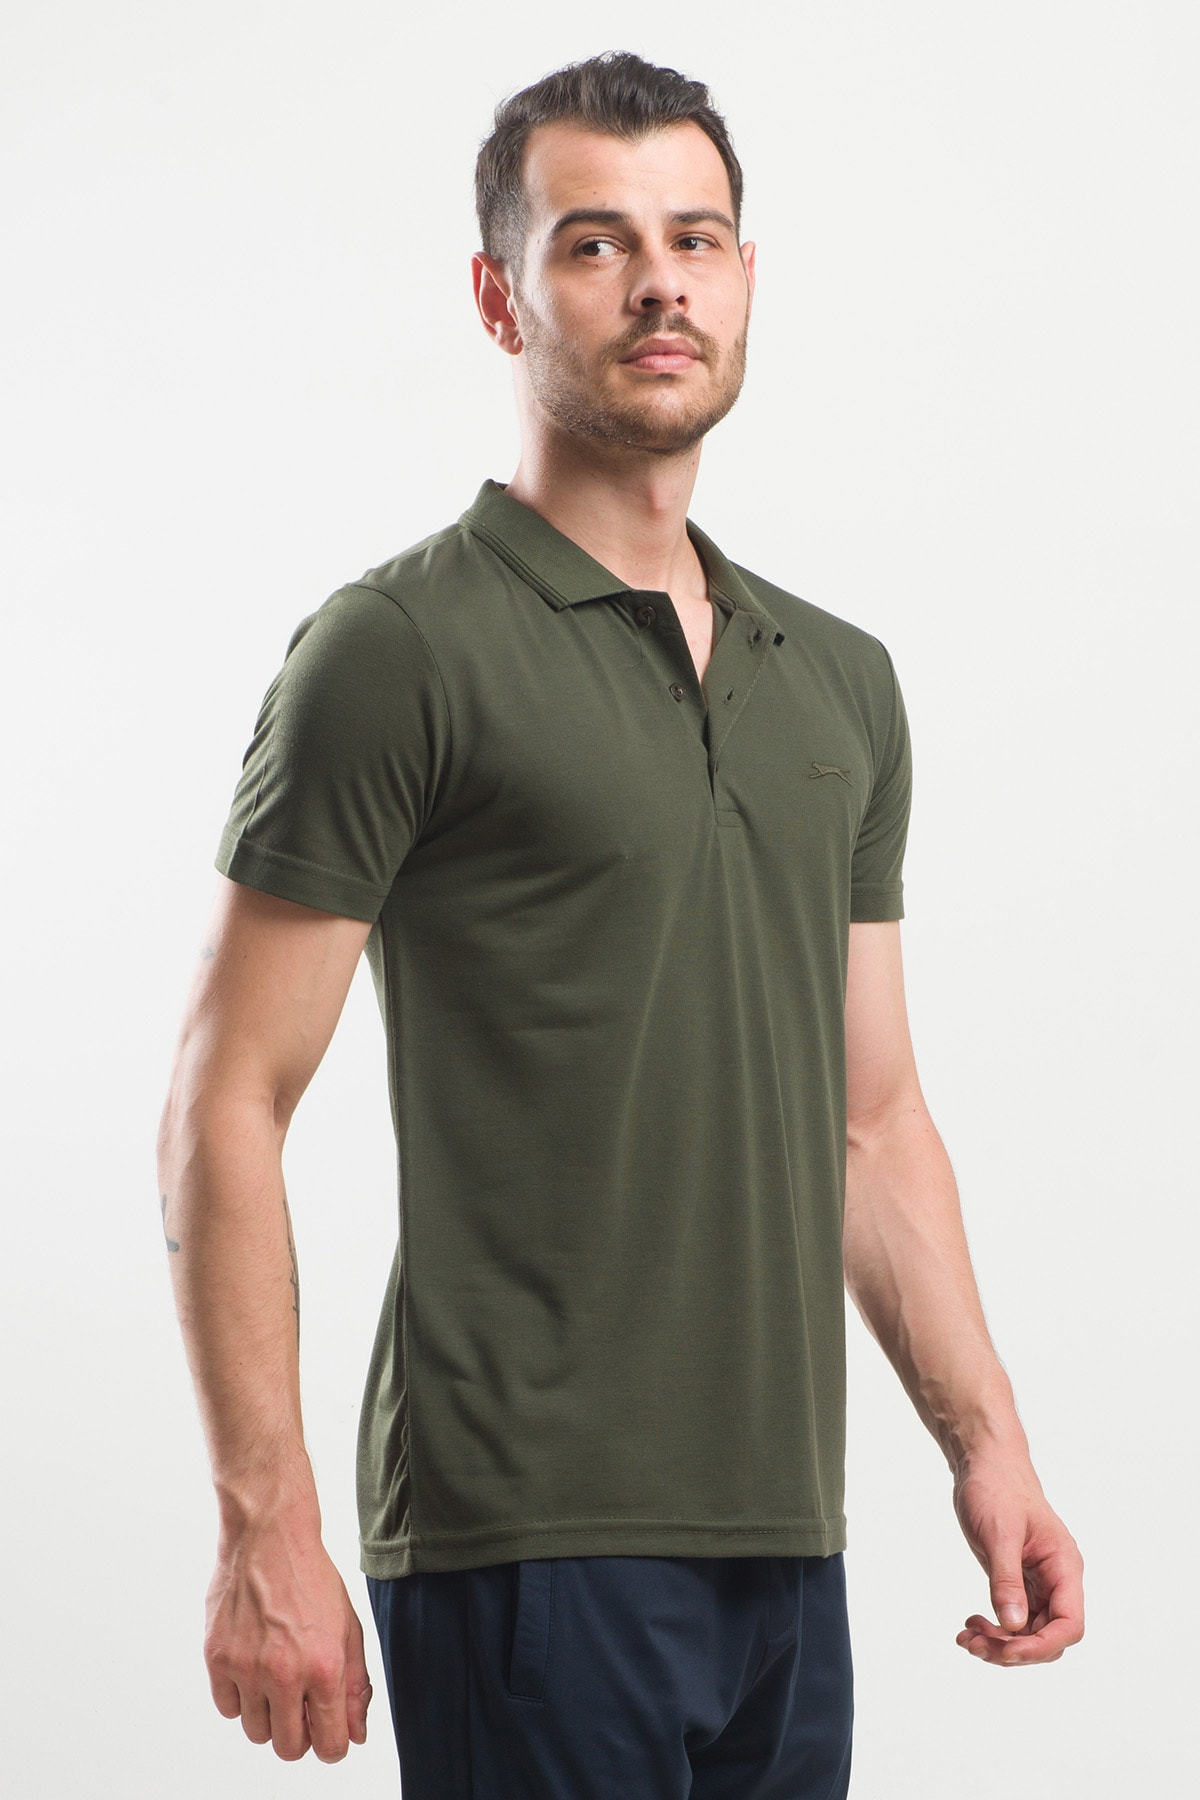 Slazenger Spırıt Erkek T-shirt Haki 2